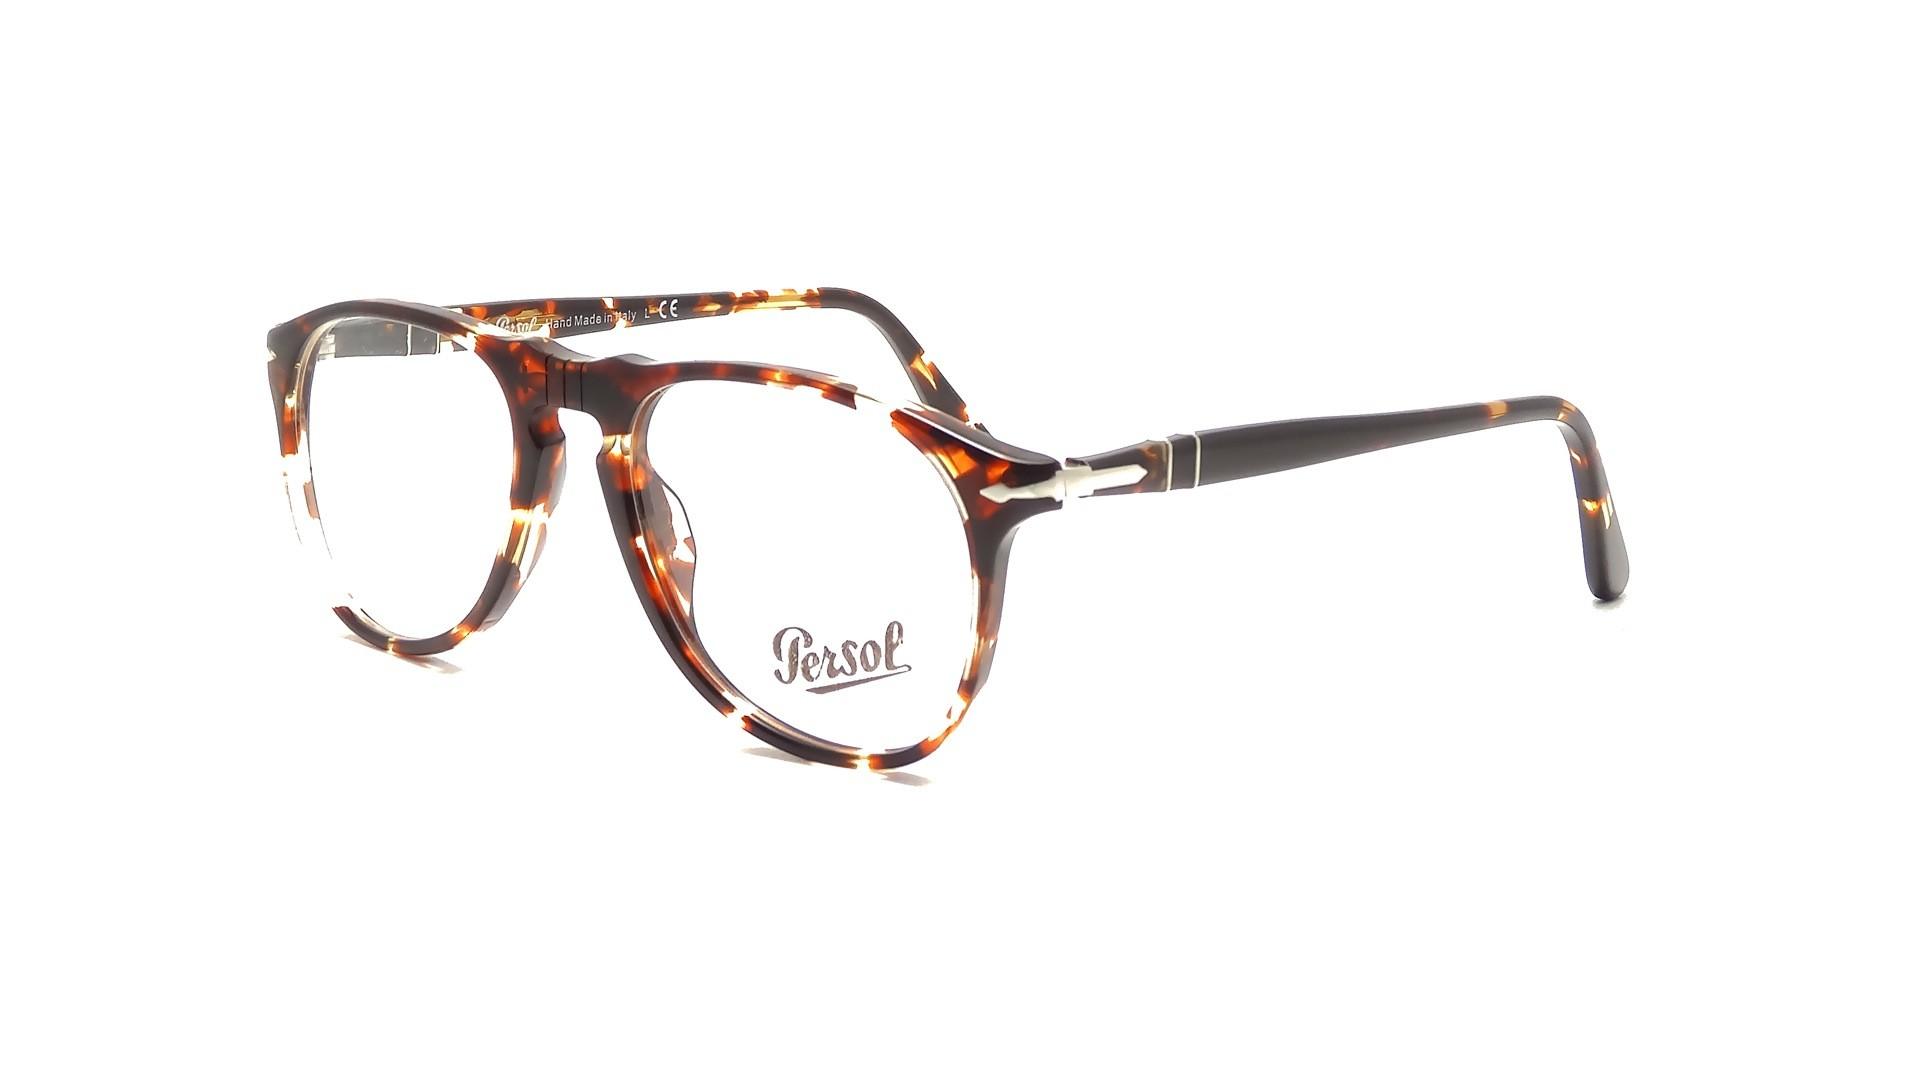 Glasses Frames Recto Or Quiapo : Eye glasses Persol PO 9649V 985 Tortoise Small